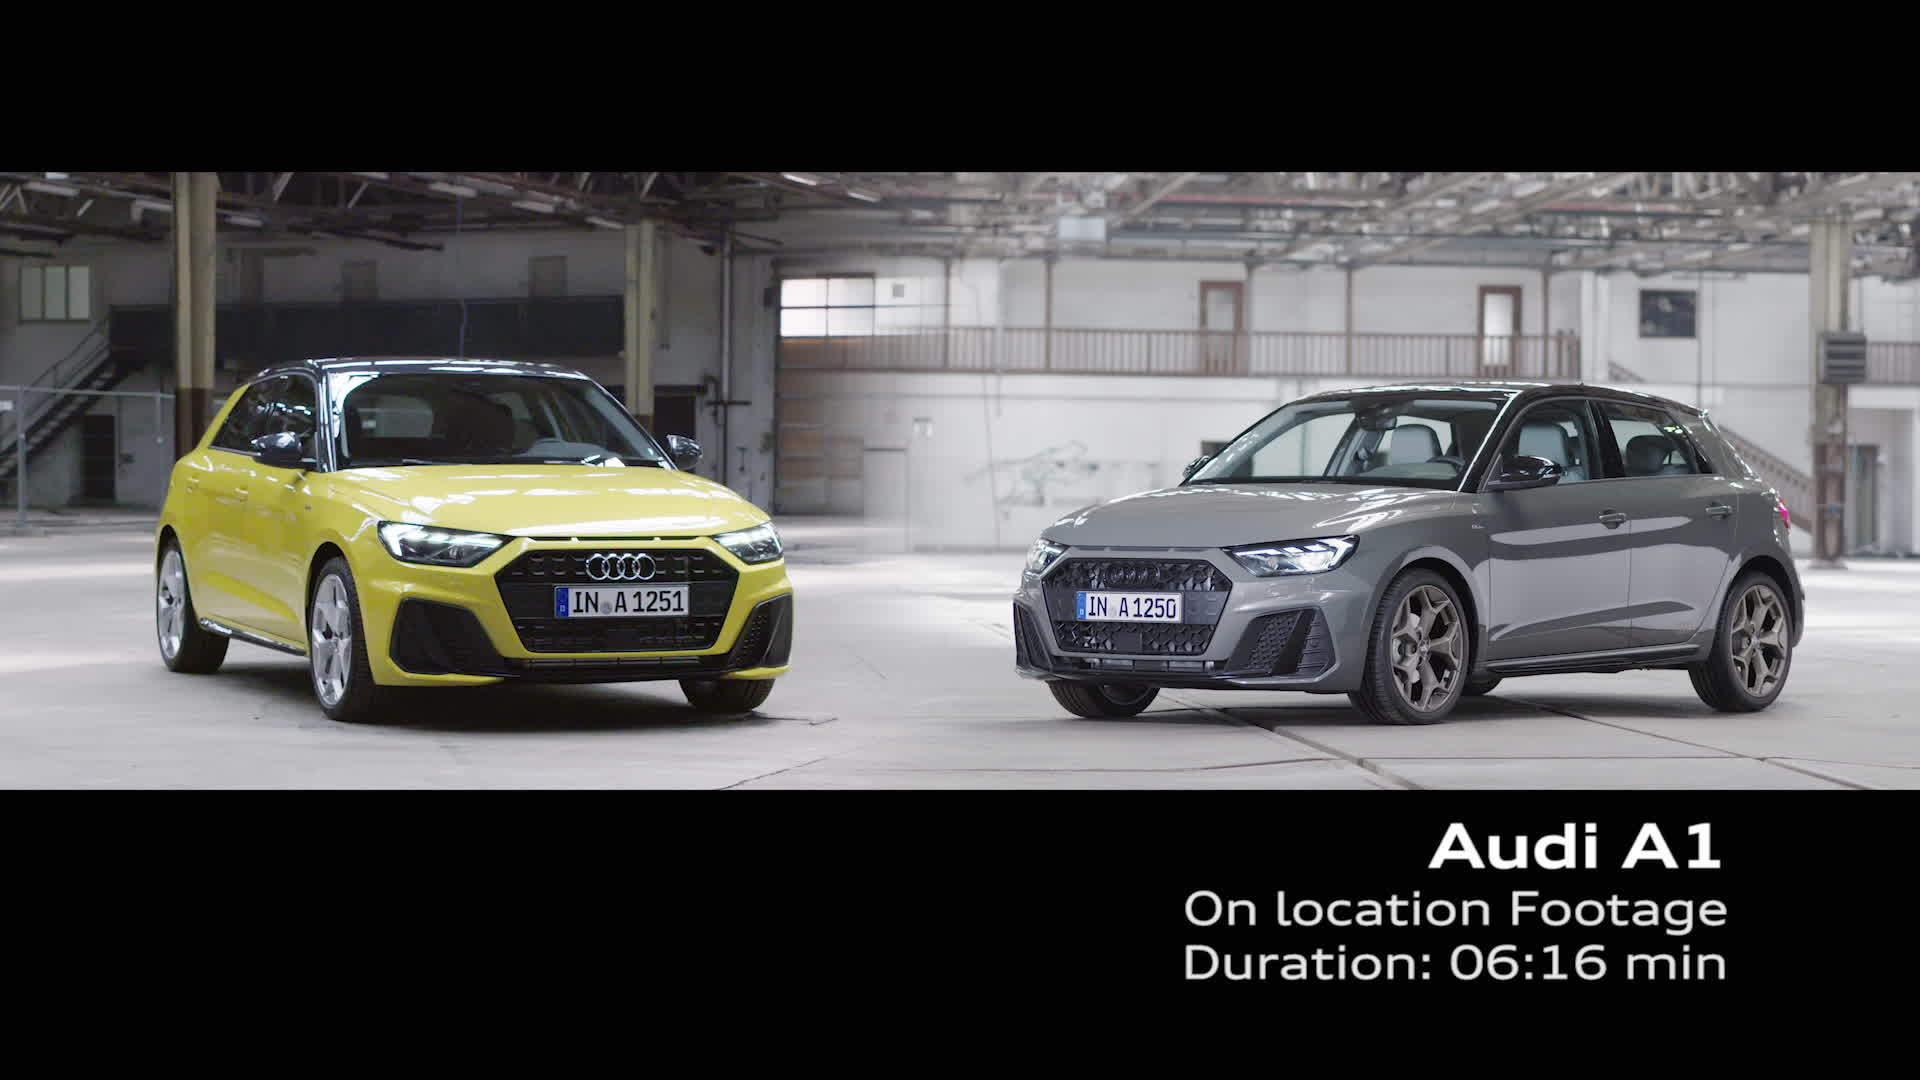 Audi A1 Sportback - On location Footage